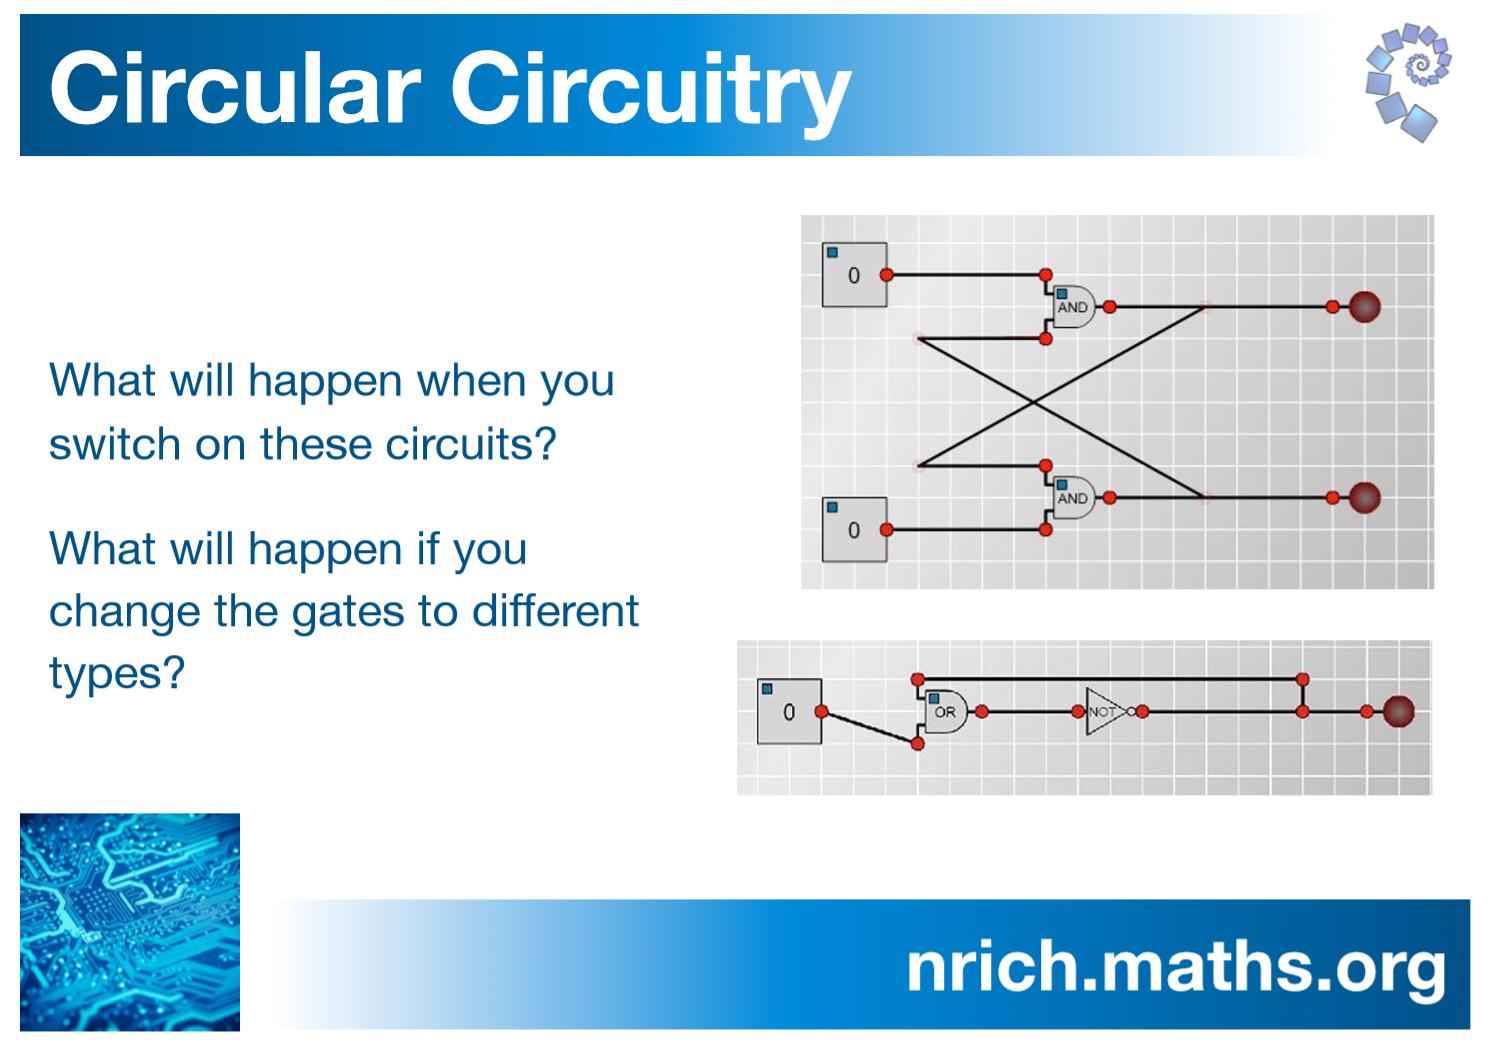 Circular Circuitry Poster : nrich.maths.org